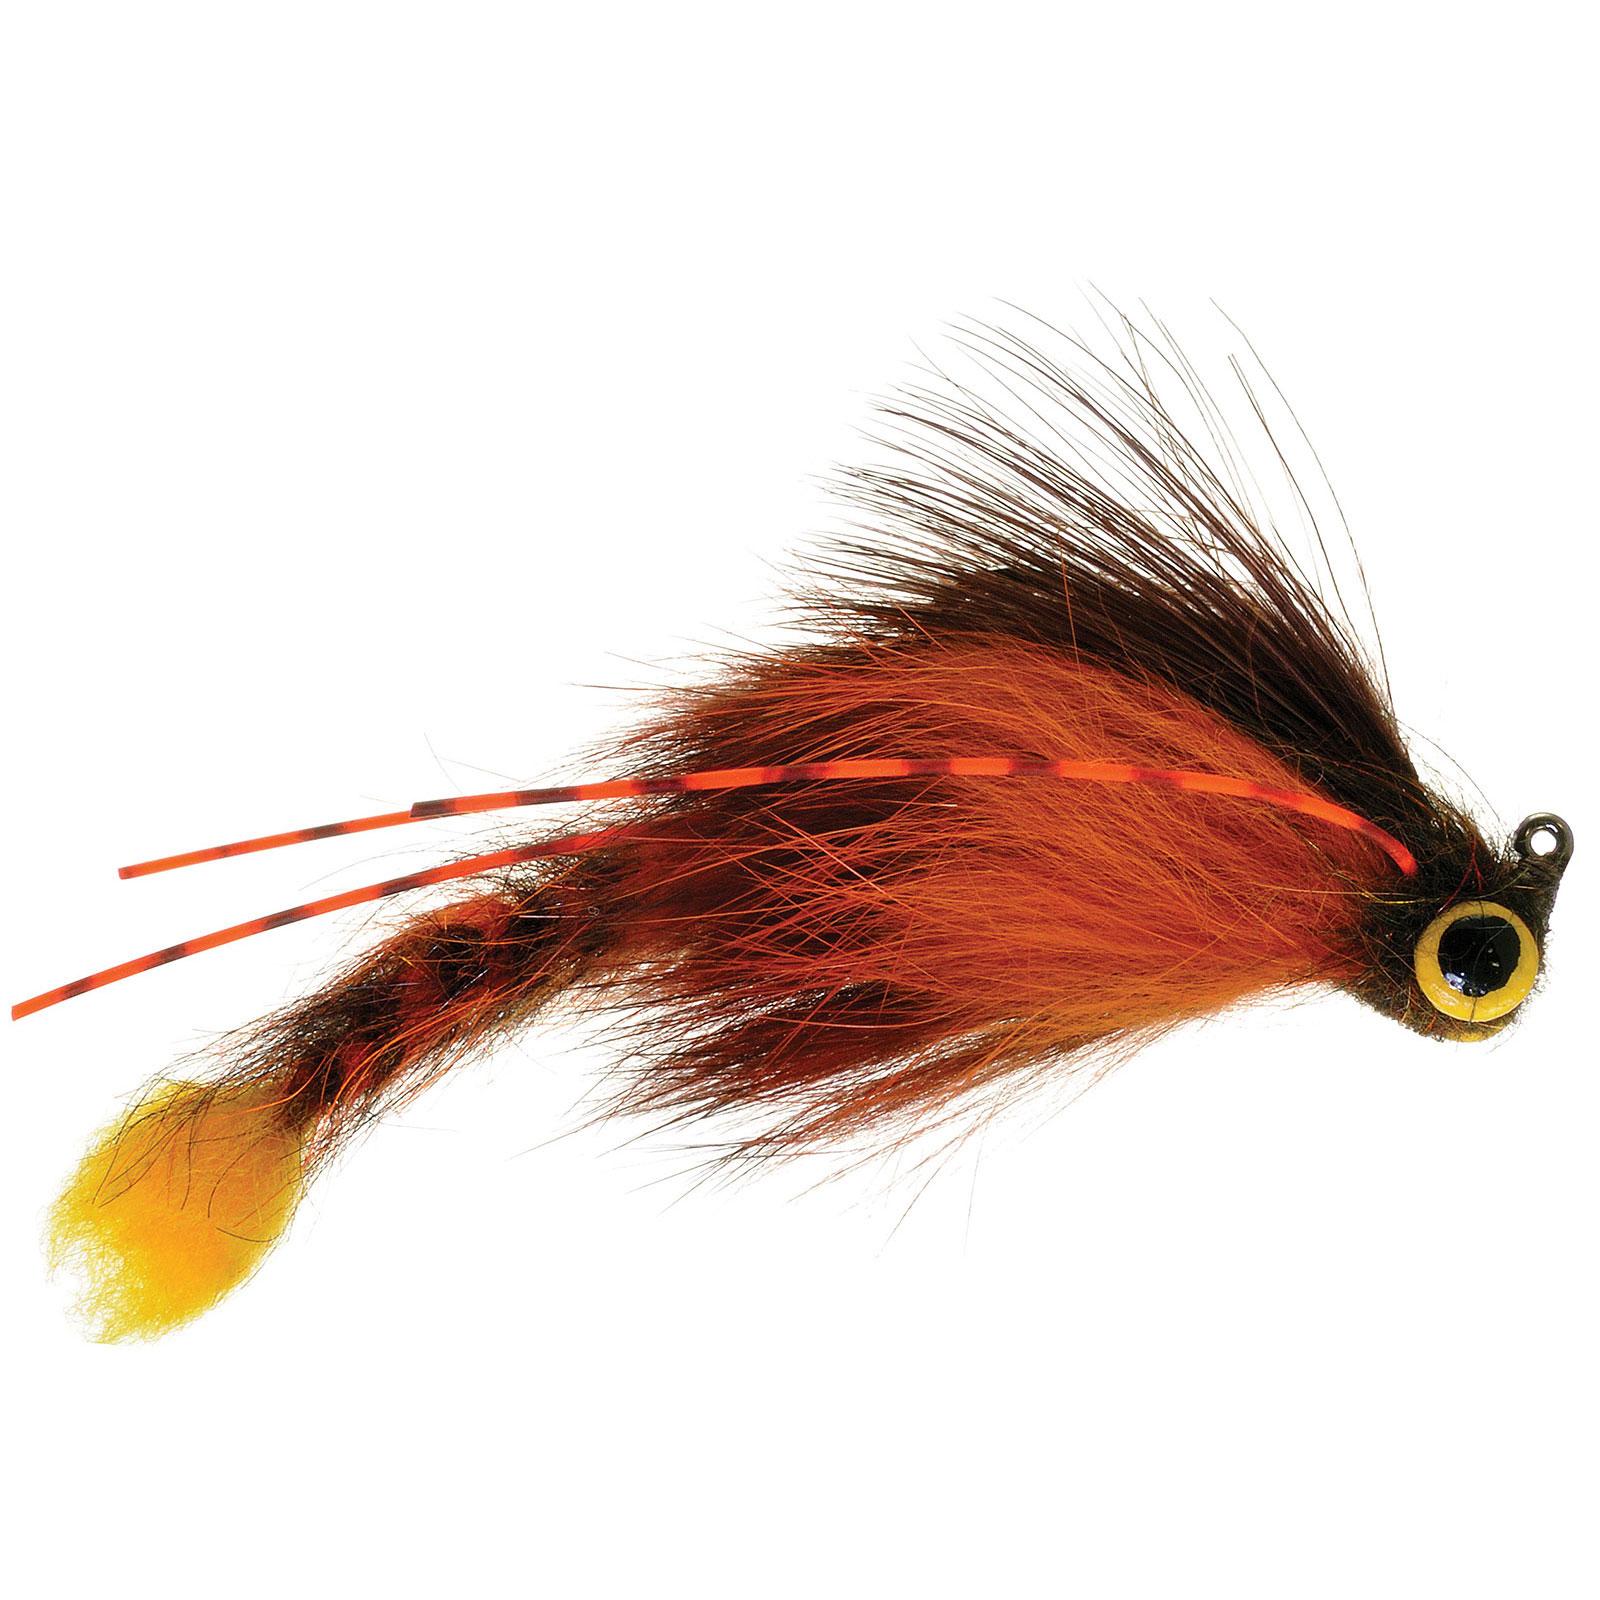 Umpqua Hart/'s Dark Lord Black 2 Pack Nymph Fly Fishing Flies